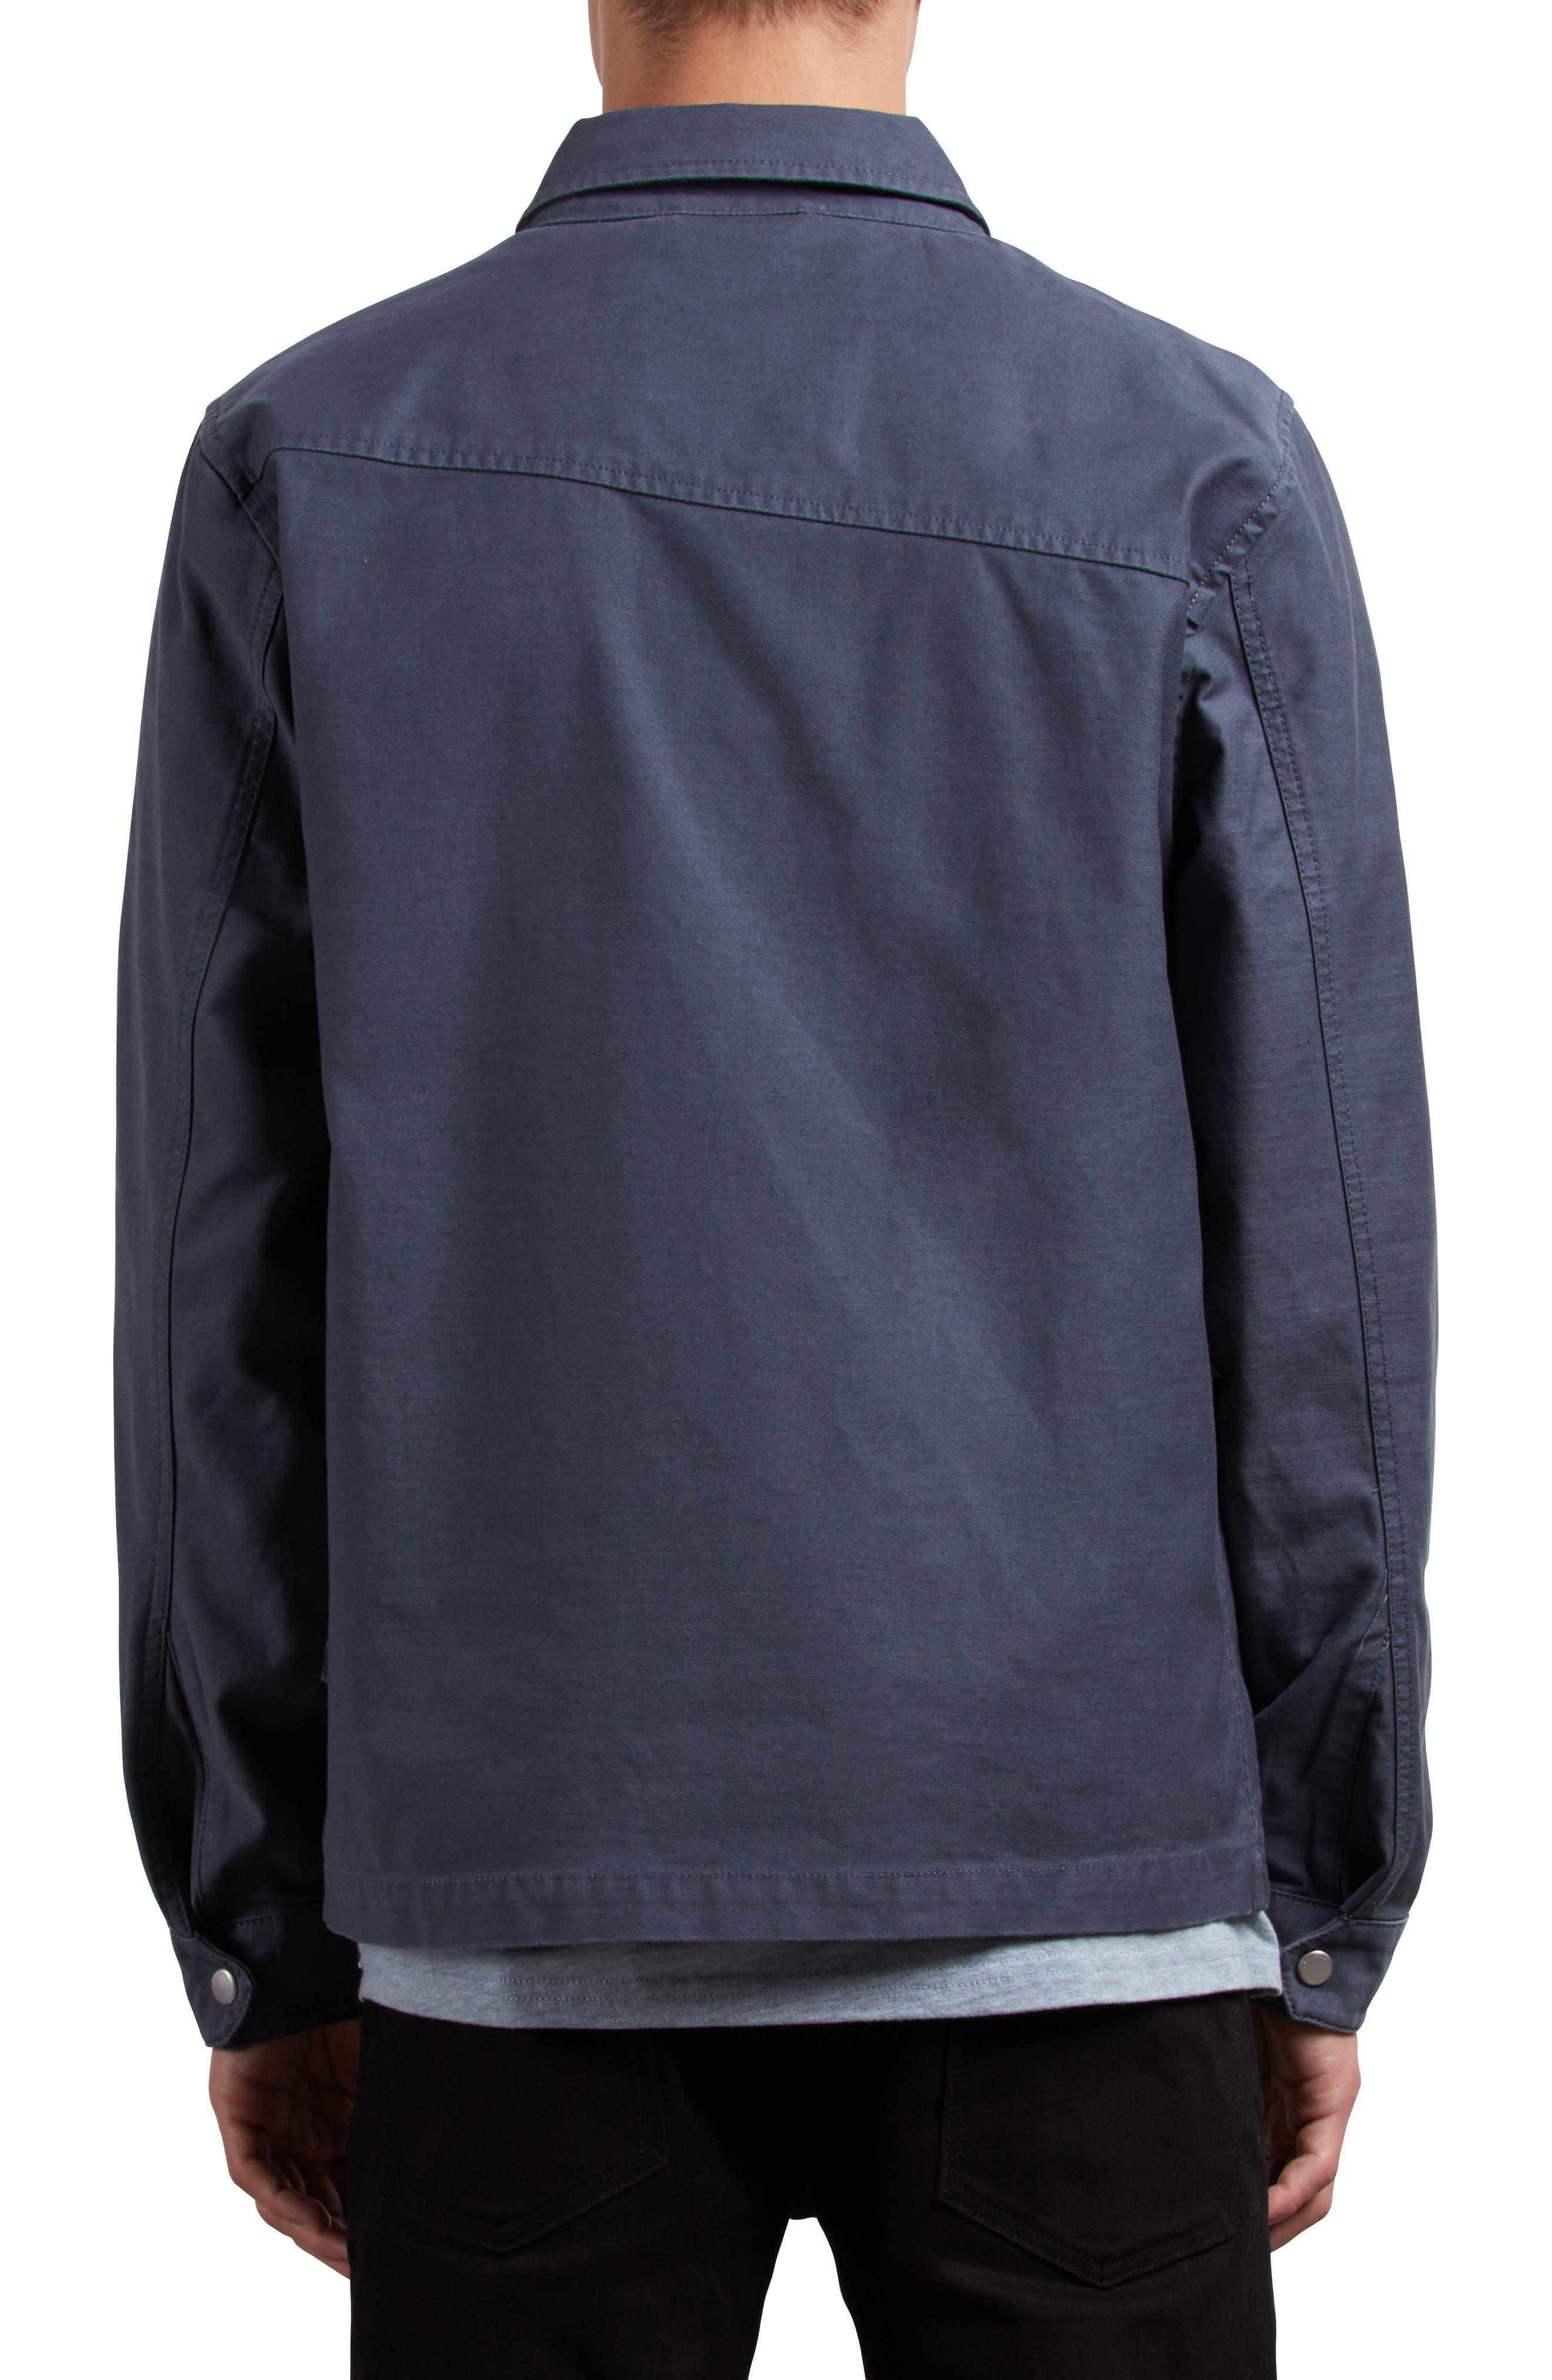 Burkey Jacket,                             Alternate thumbnail 2, color,                             402